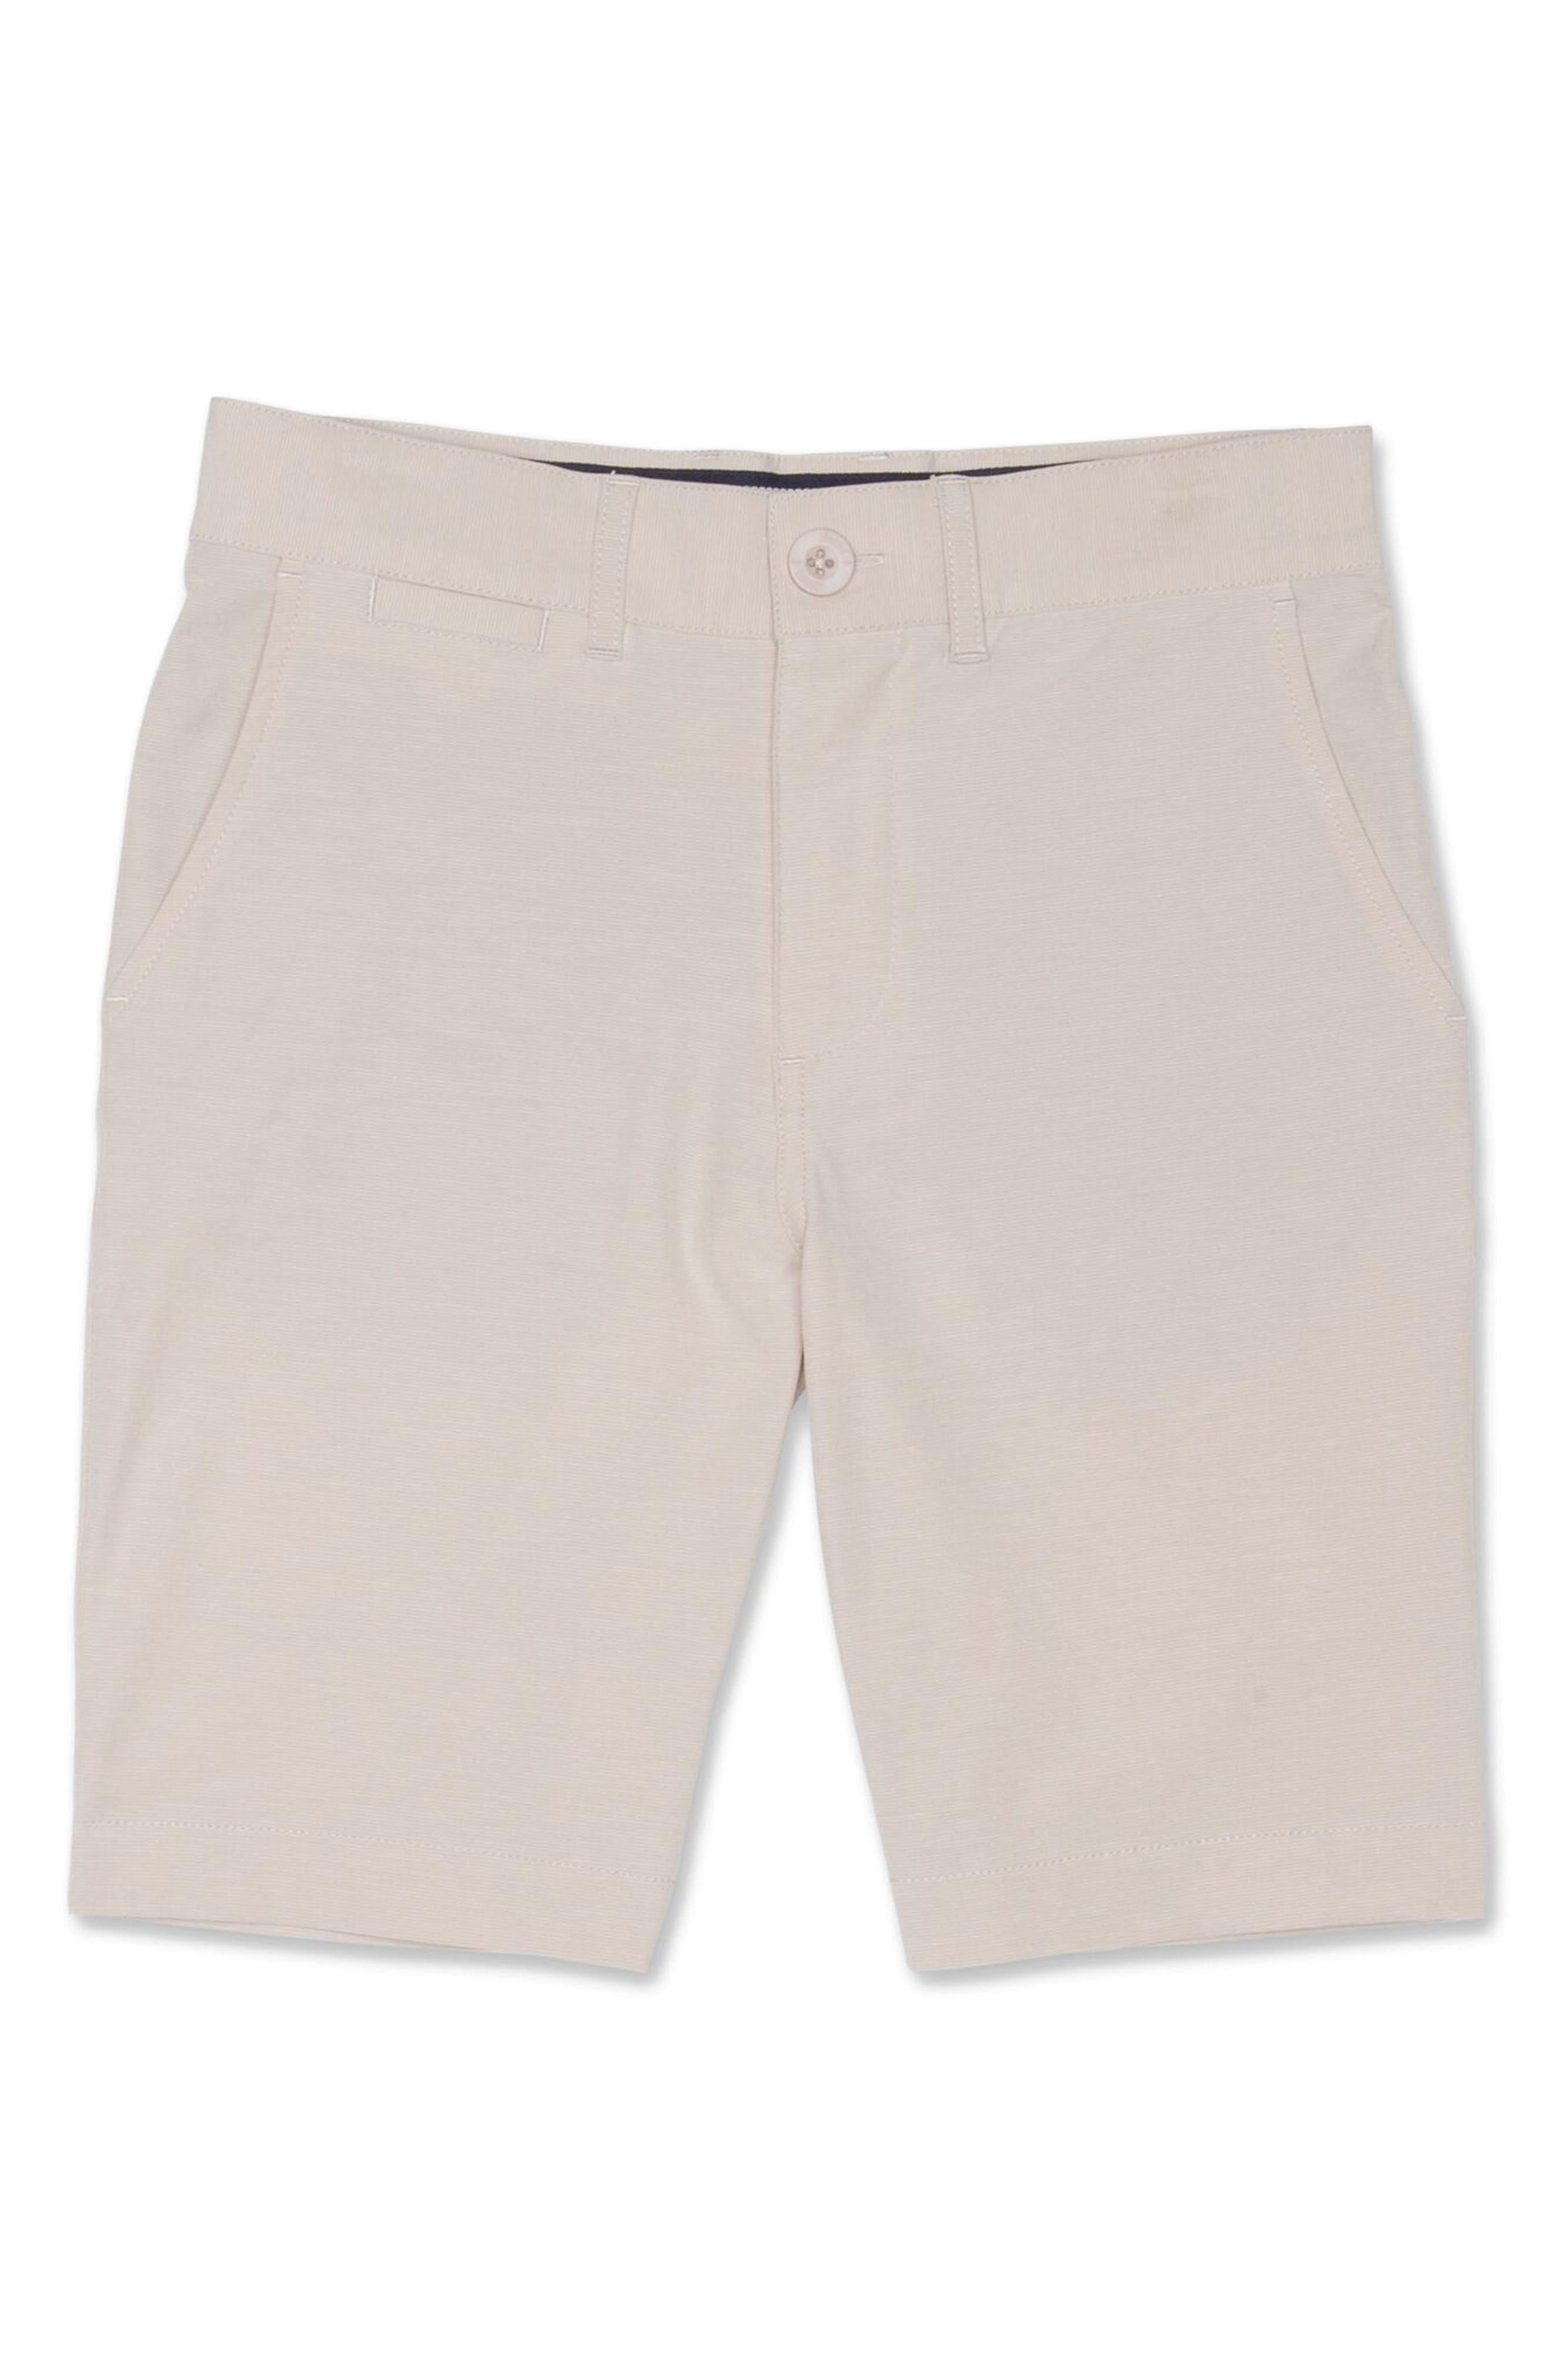 Alternate Image 1 Selected - johnnie-o Wyatt Shorts (Big Boys)